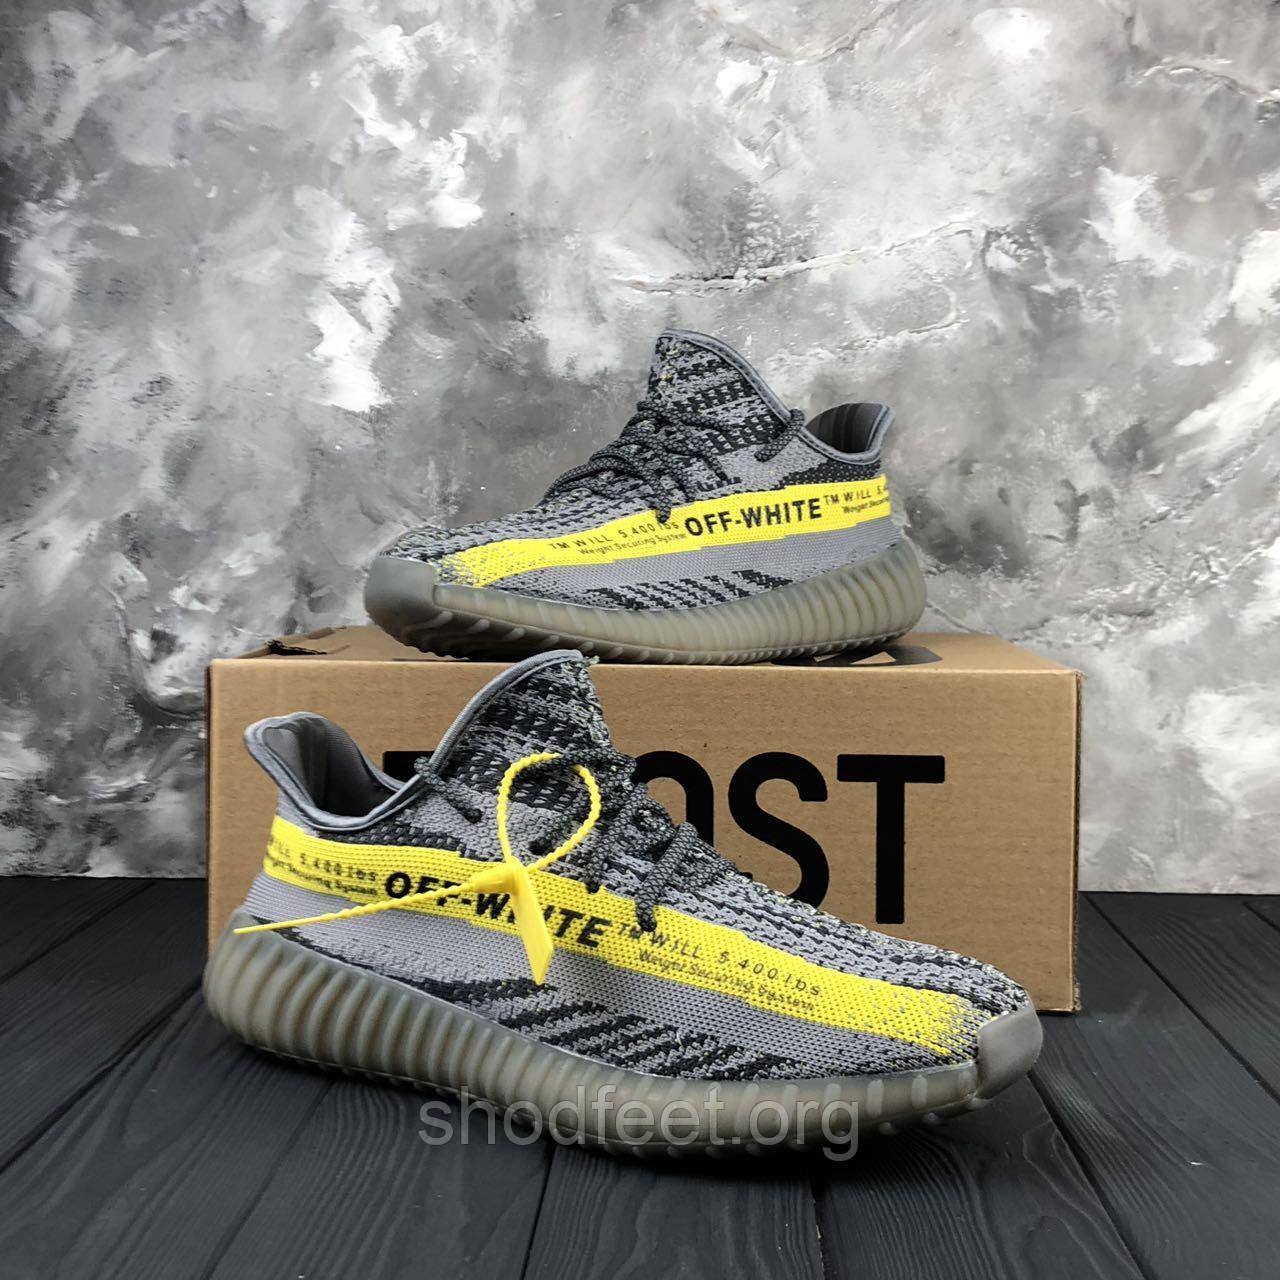 Кроссовки Adidas Yeezy Boost 350 x Off White Grey